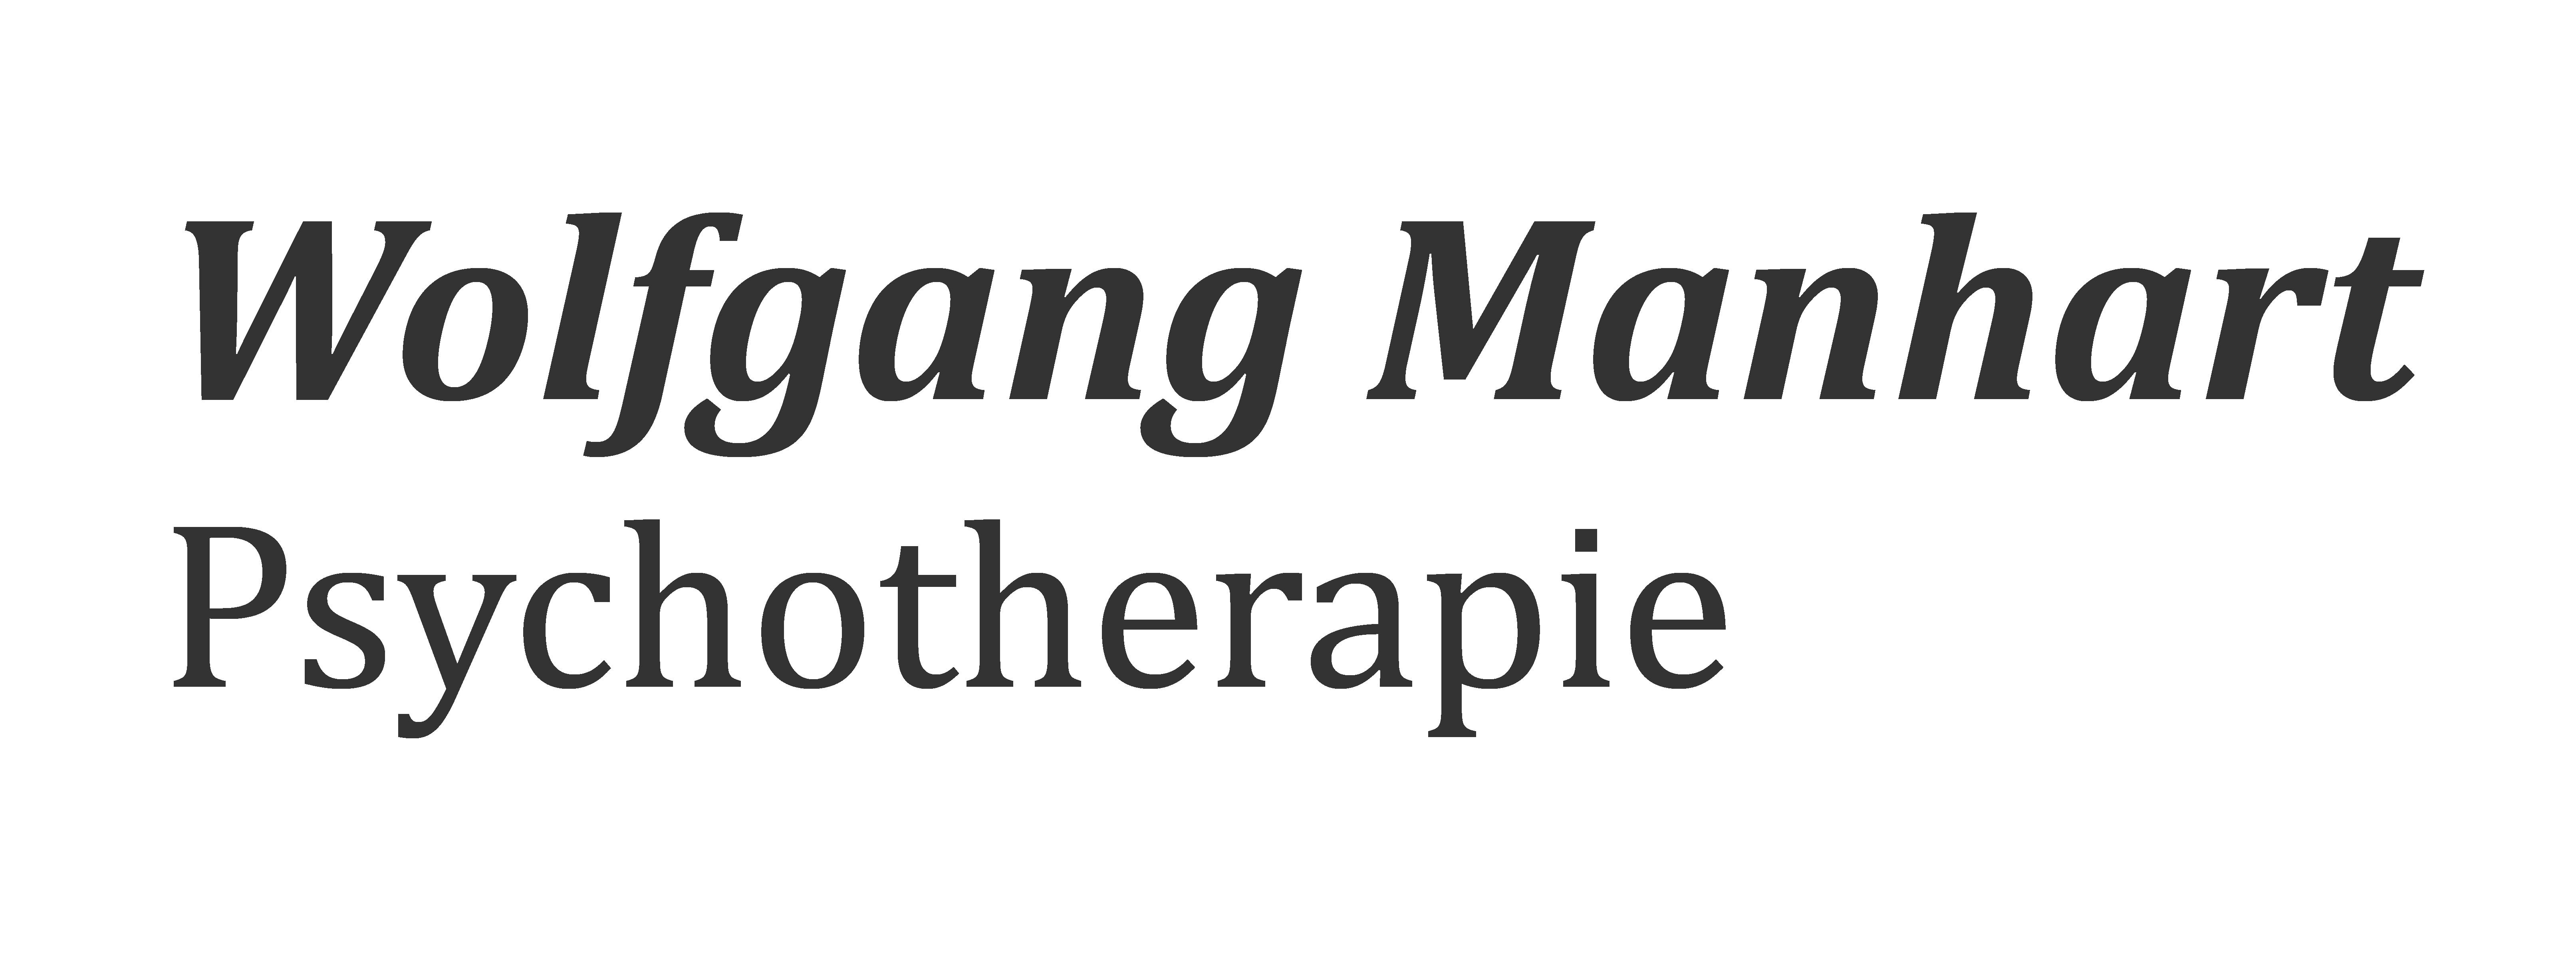 Wolfgang Manhart